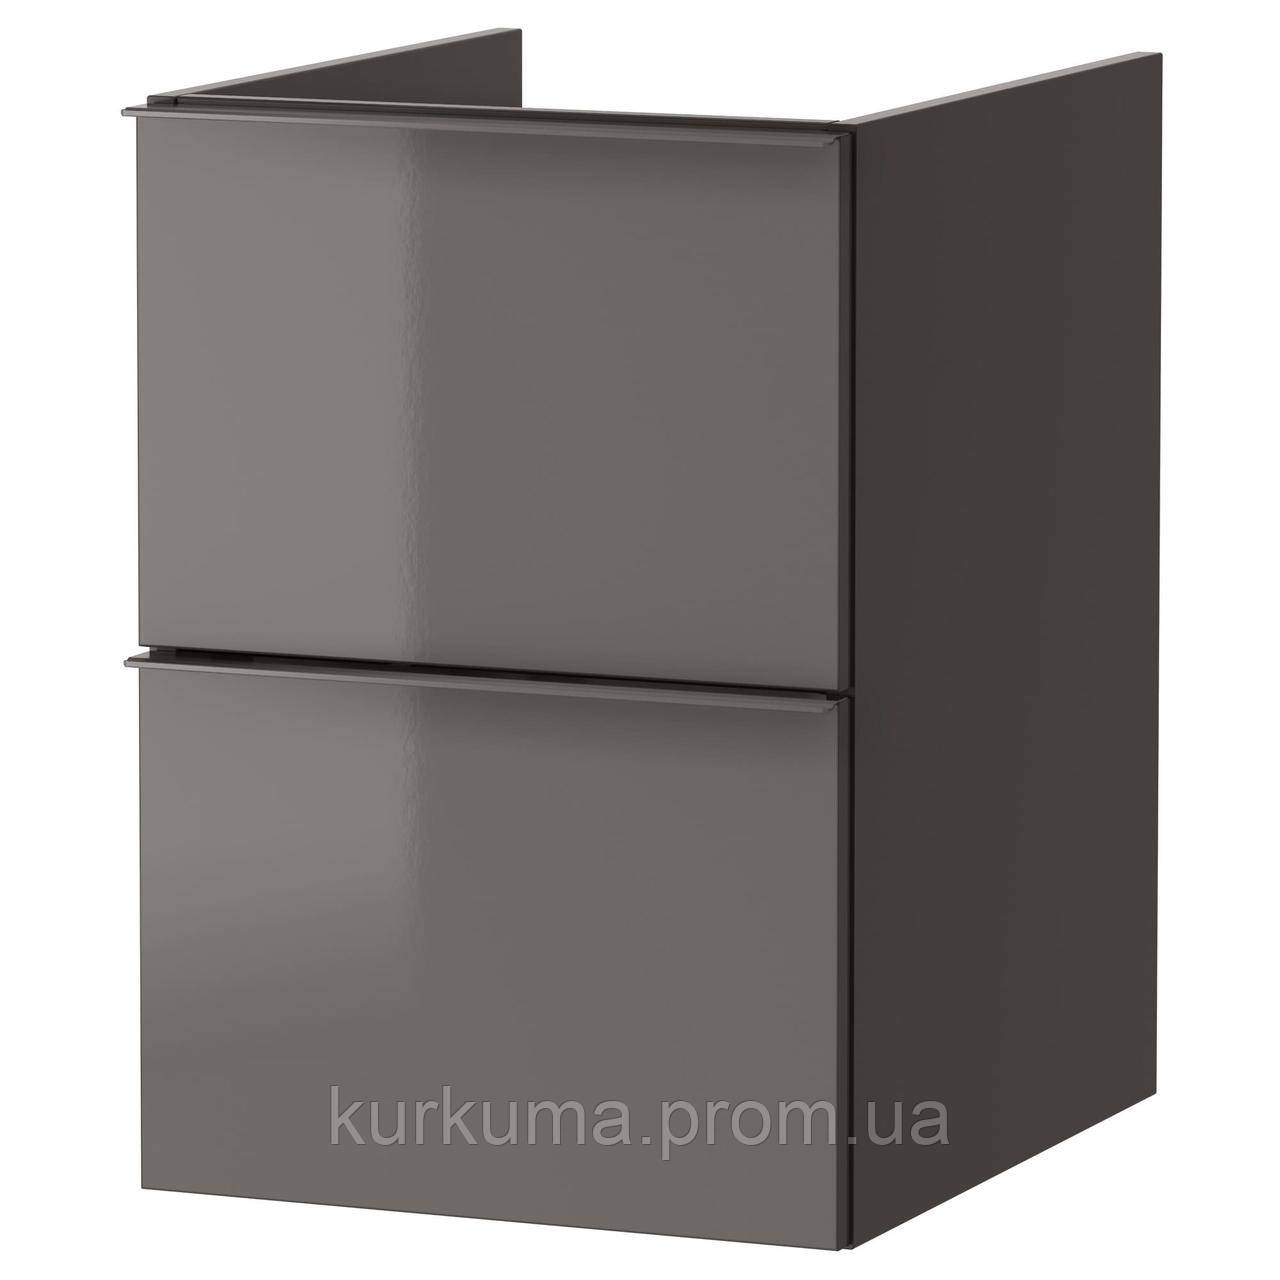 IKEA GODMORGON Шкаф под умывальник, глянцевый серый  (303.246.49)